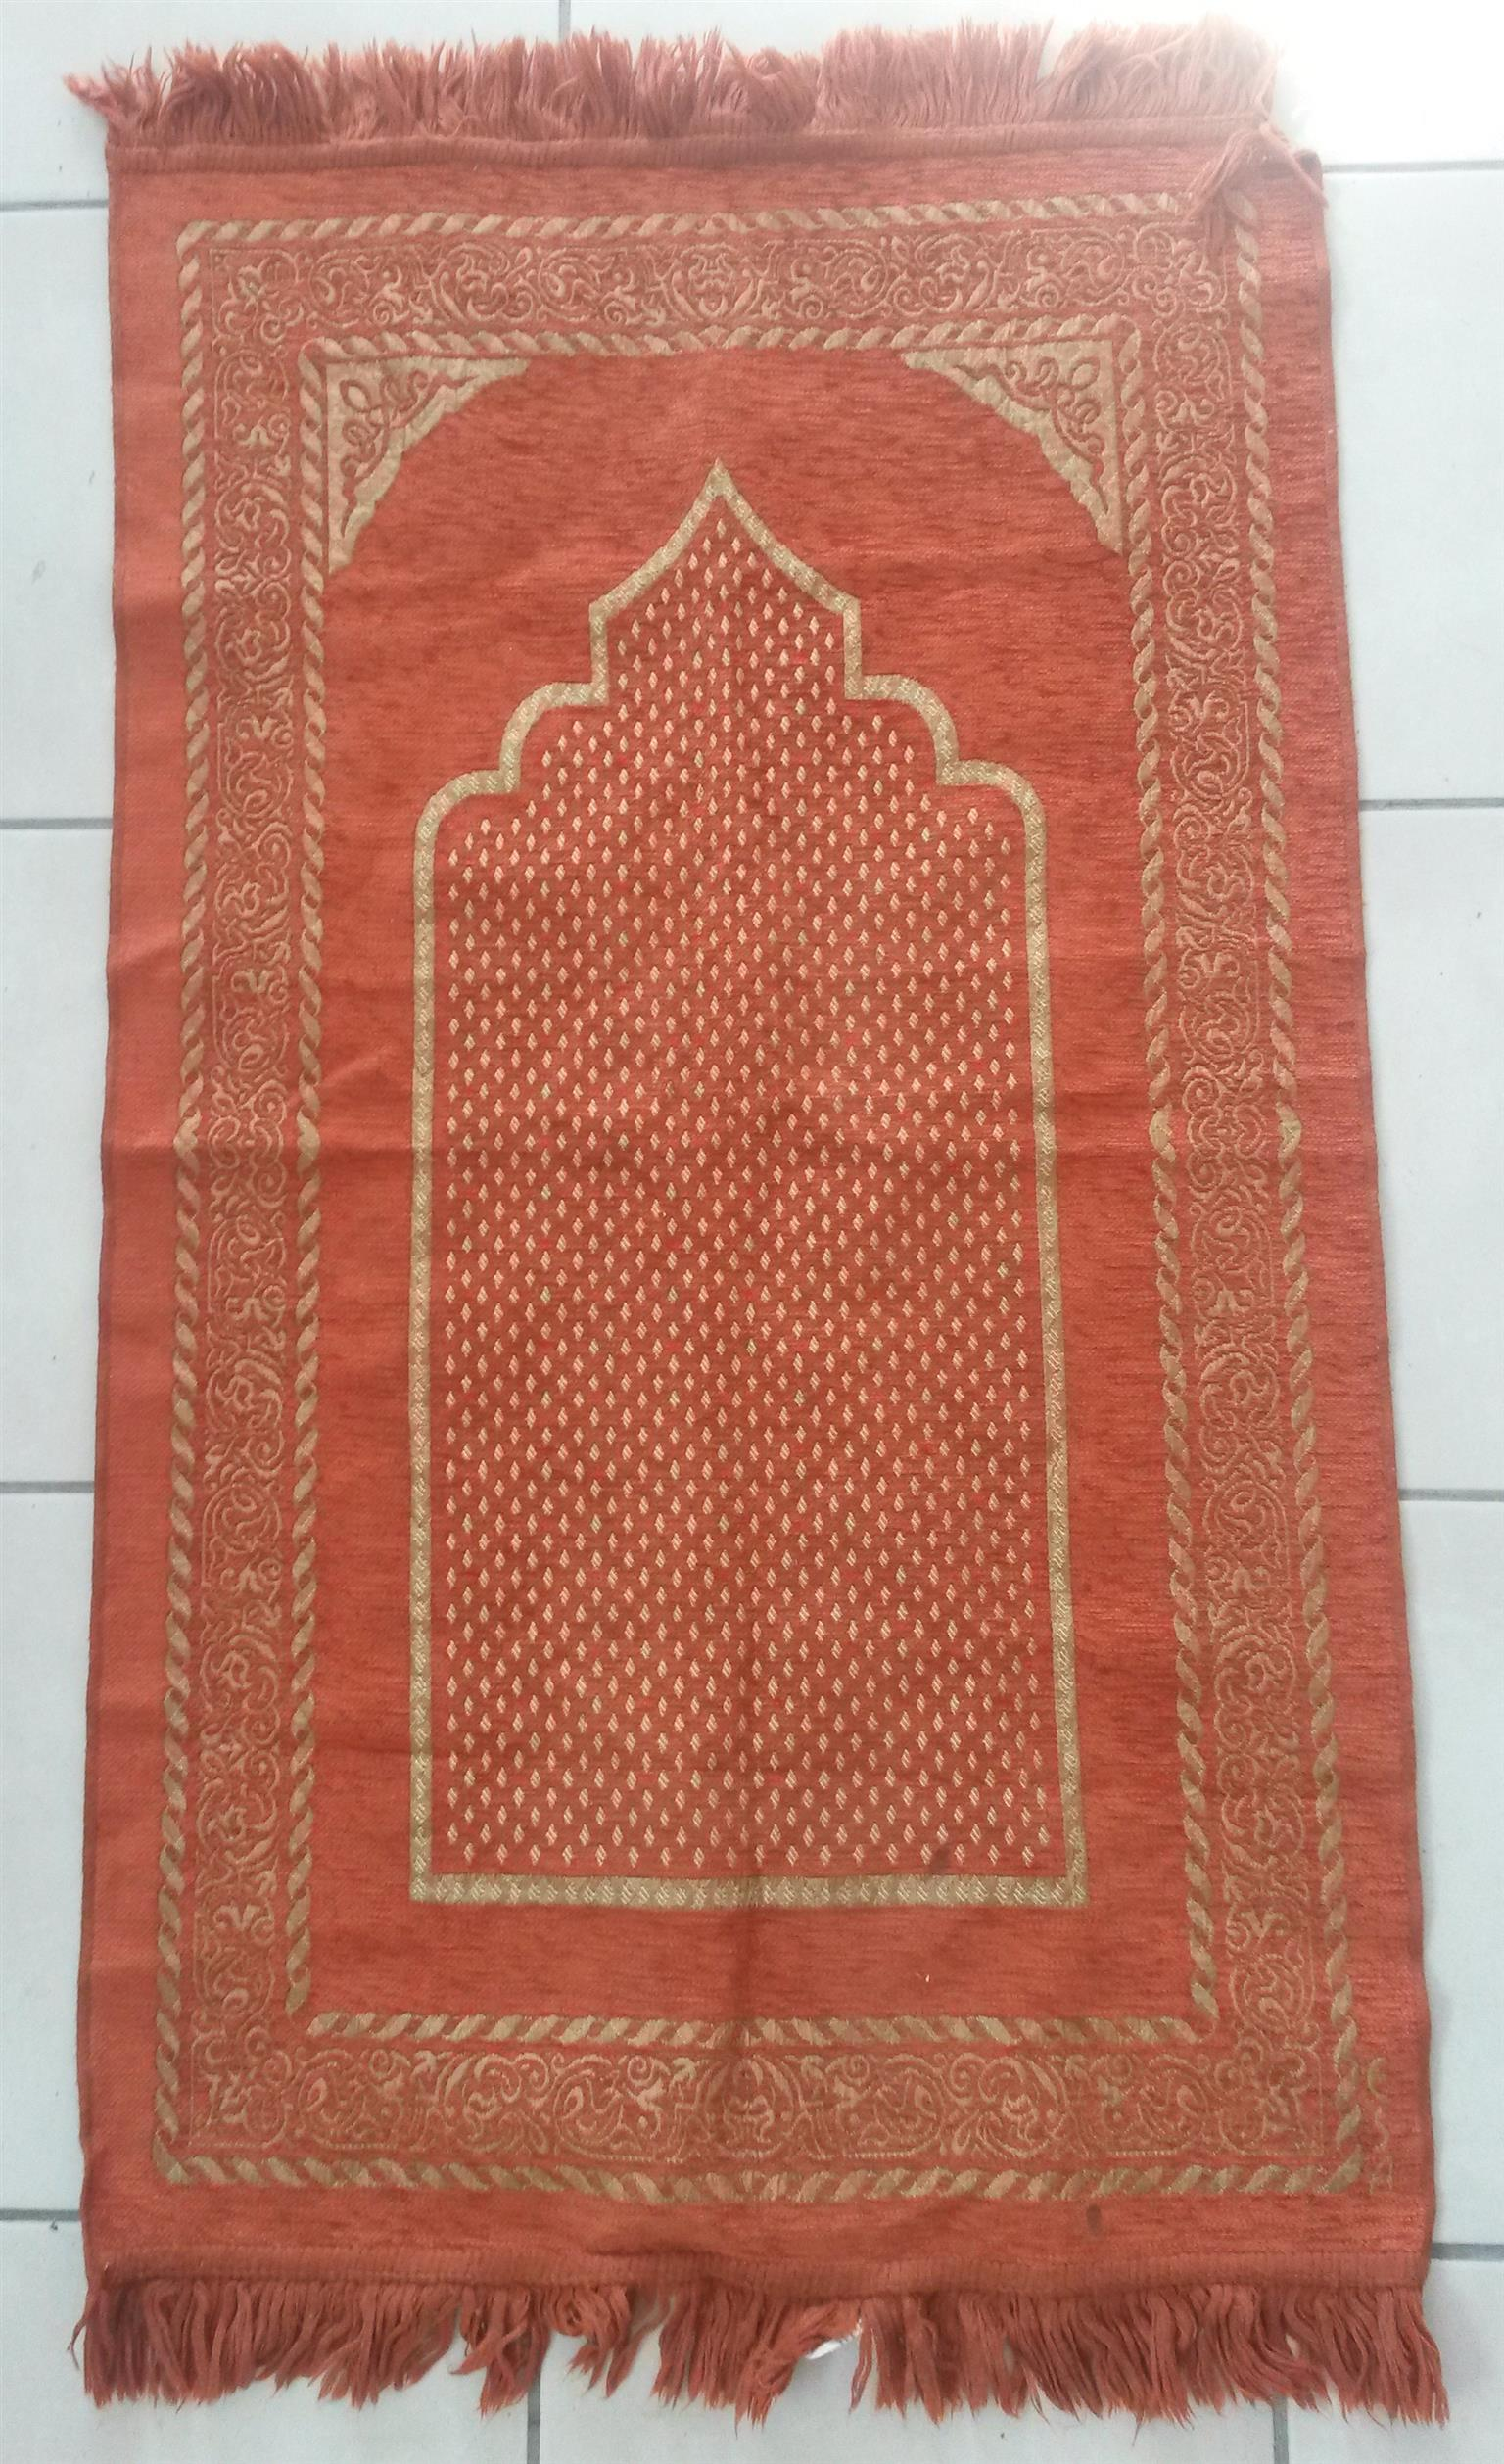 Musalah / Prayer Rug from Turkey_R500.